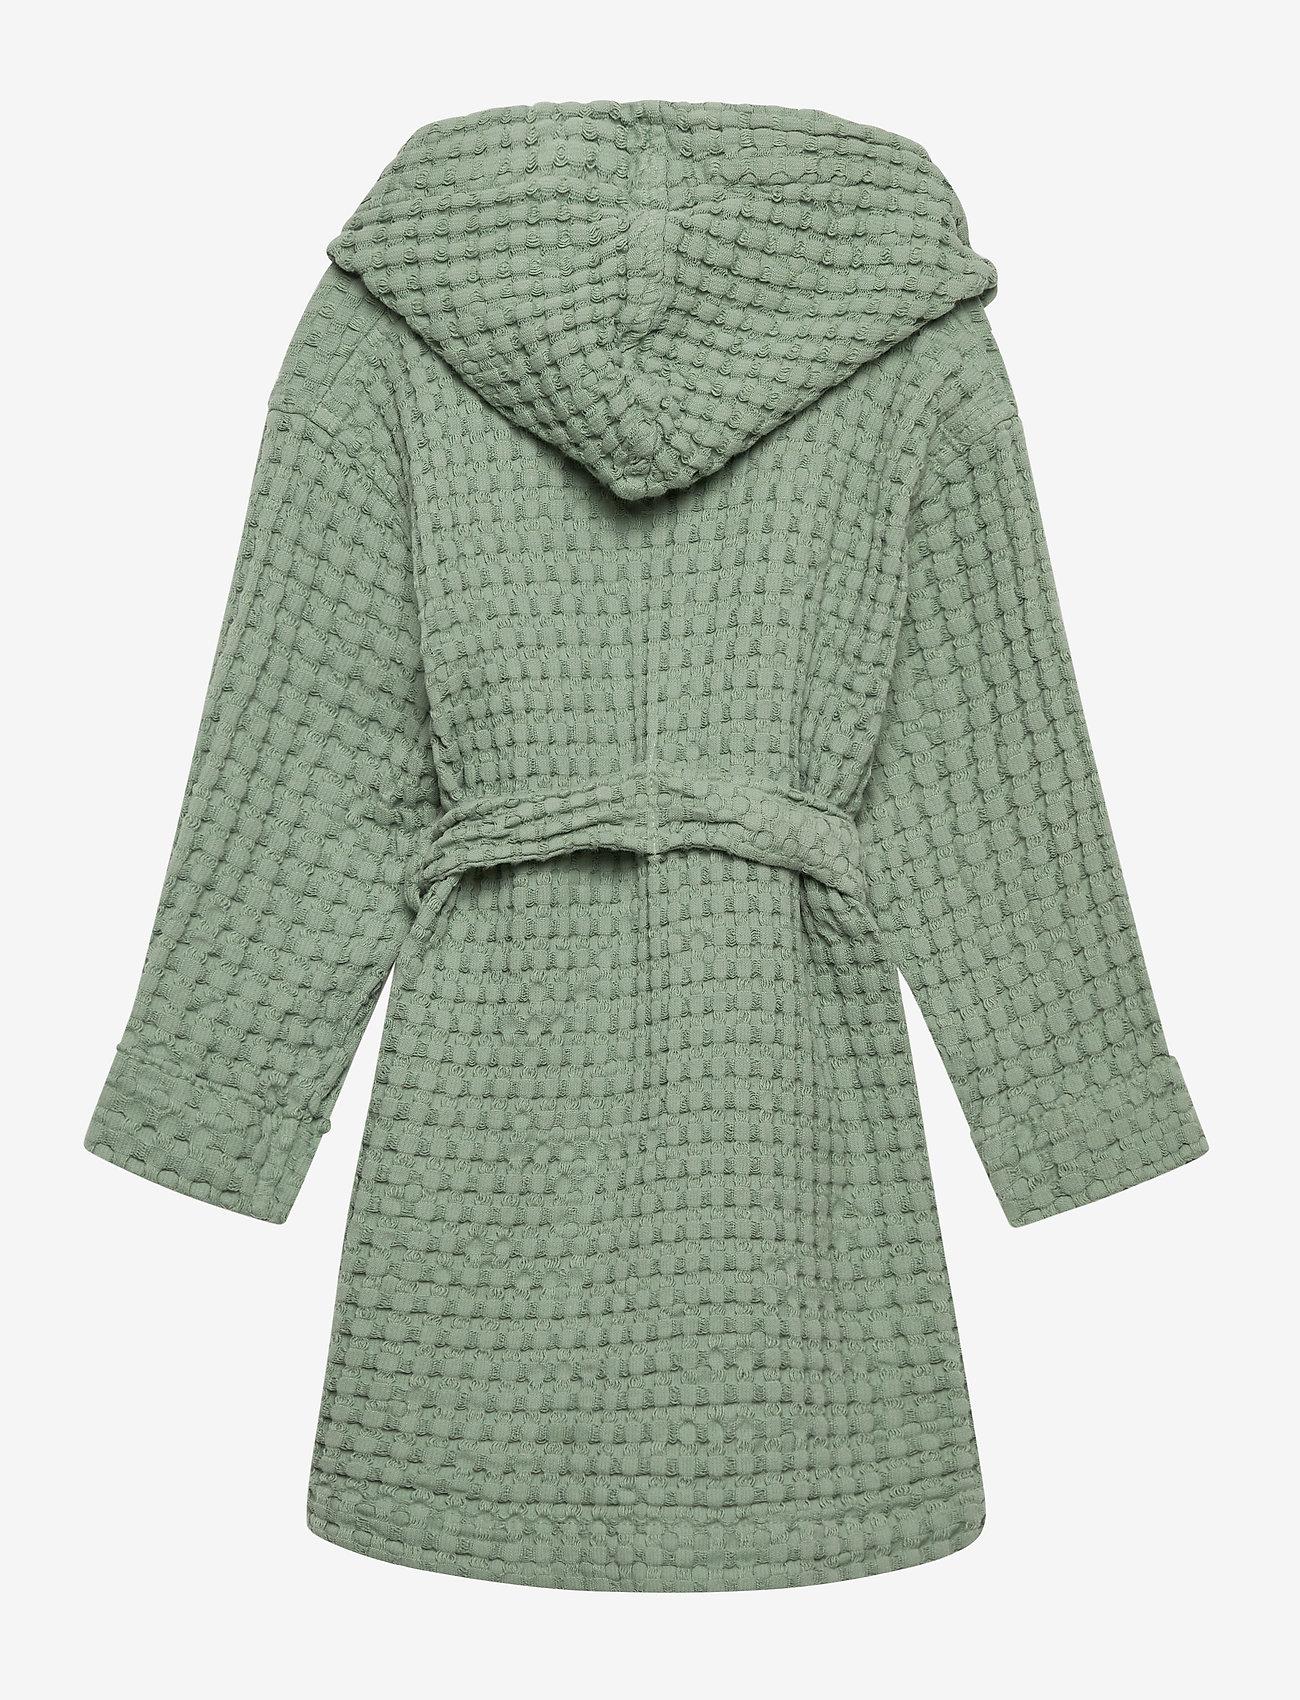 Cozy by Dozy - Cozy by Dozy Bath Robe - bathrobes - green - 1